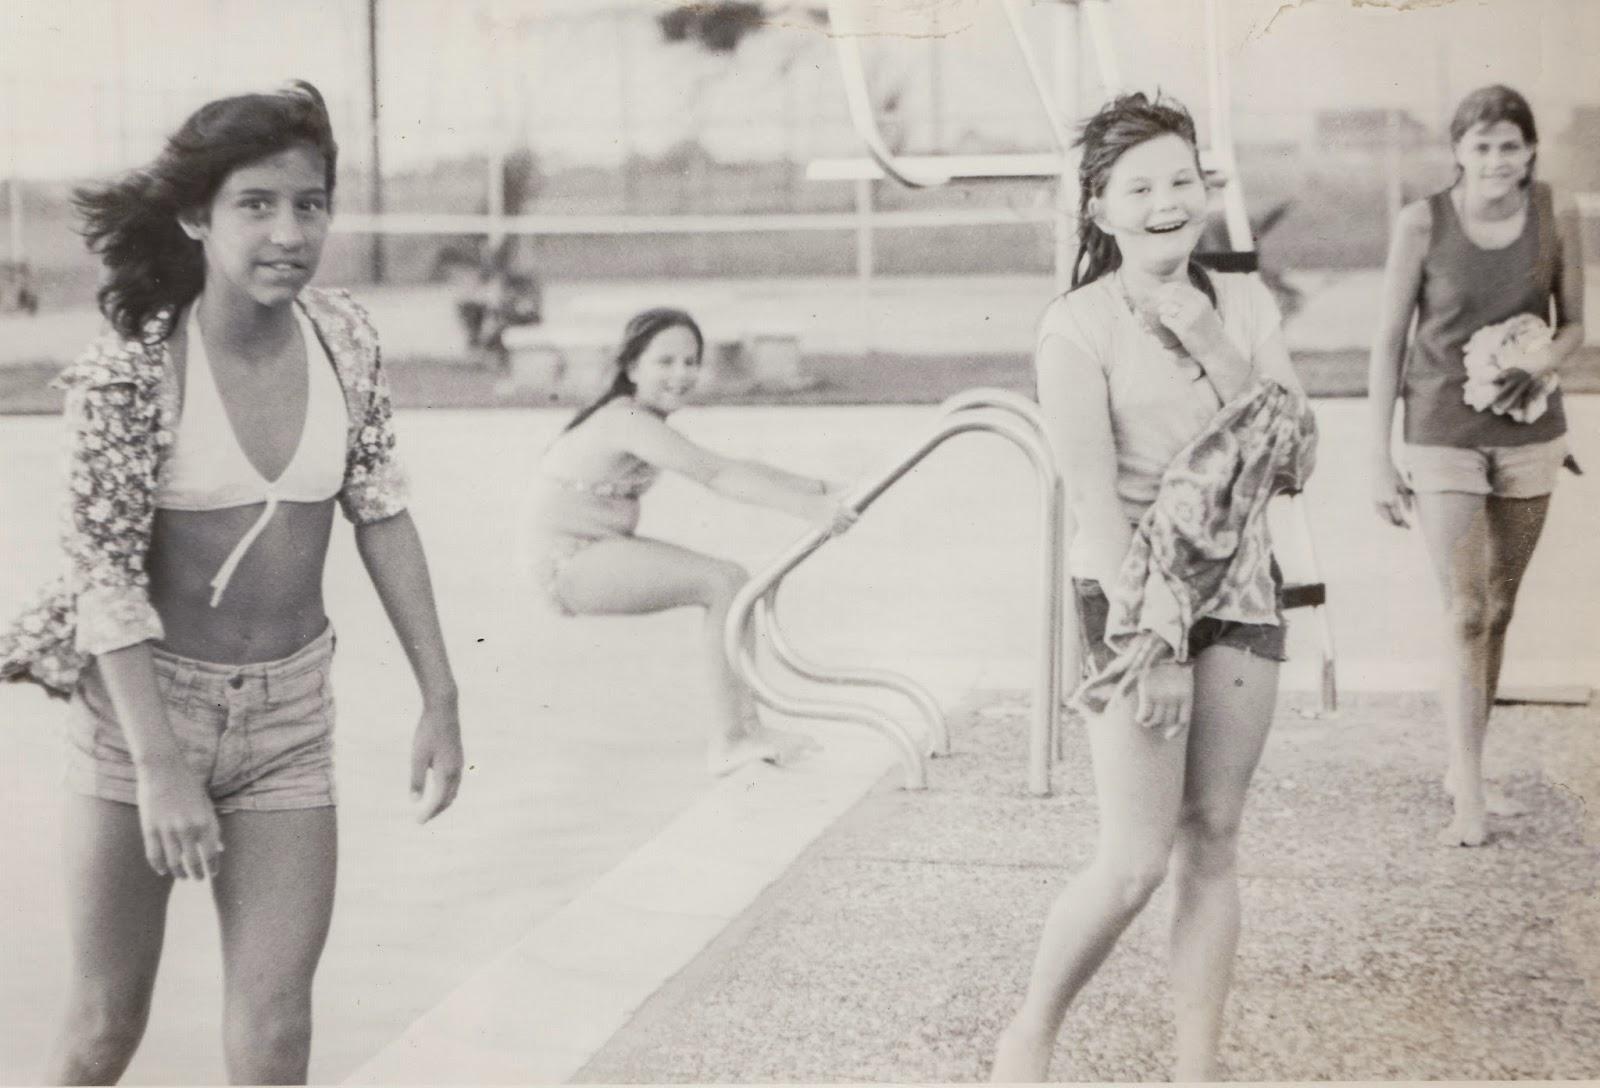 south belt houston digital history archive 7 13 77 the sagemont rec pool